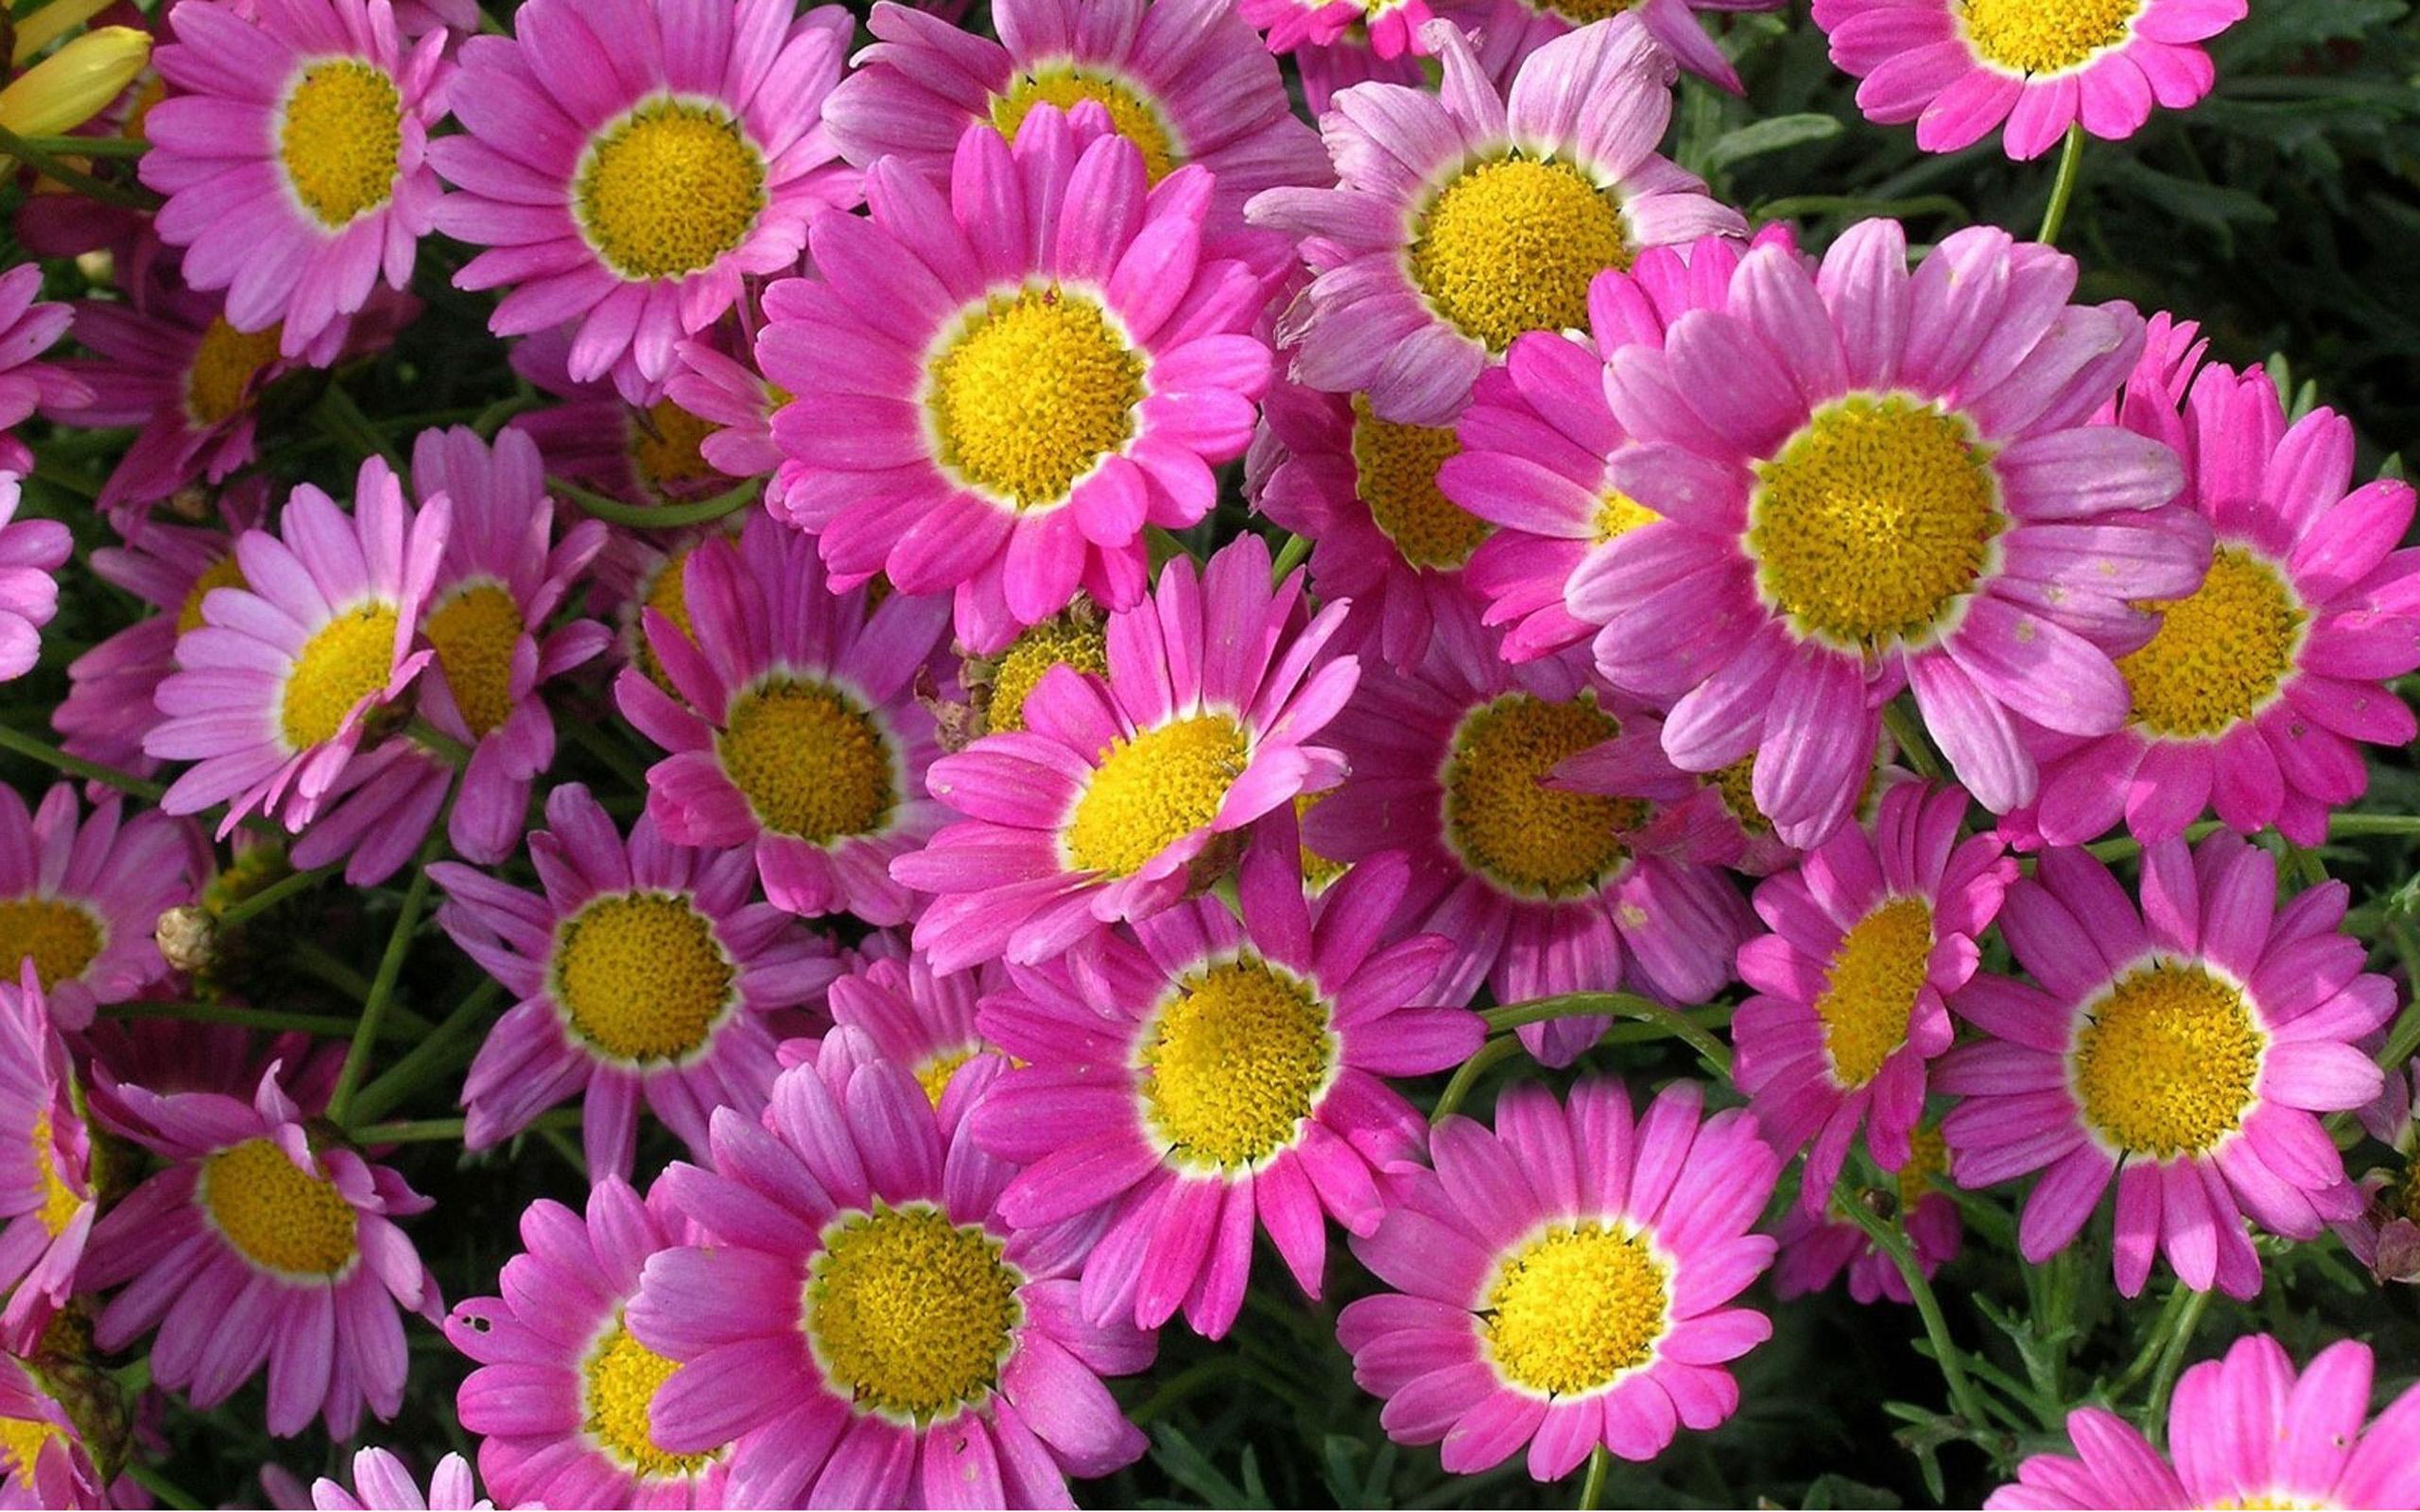 All Beautiful Flowers 2560x1600 Wallpaper Teahub Io